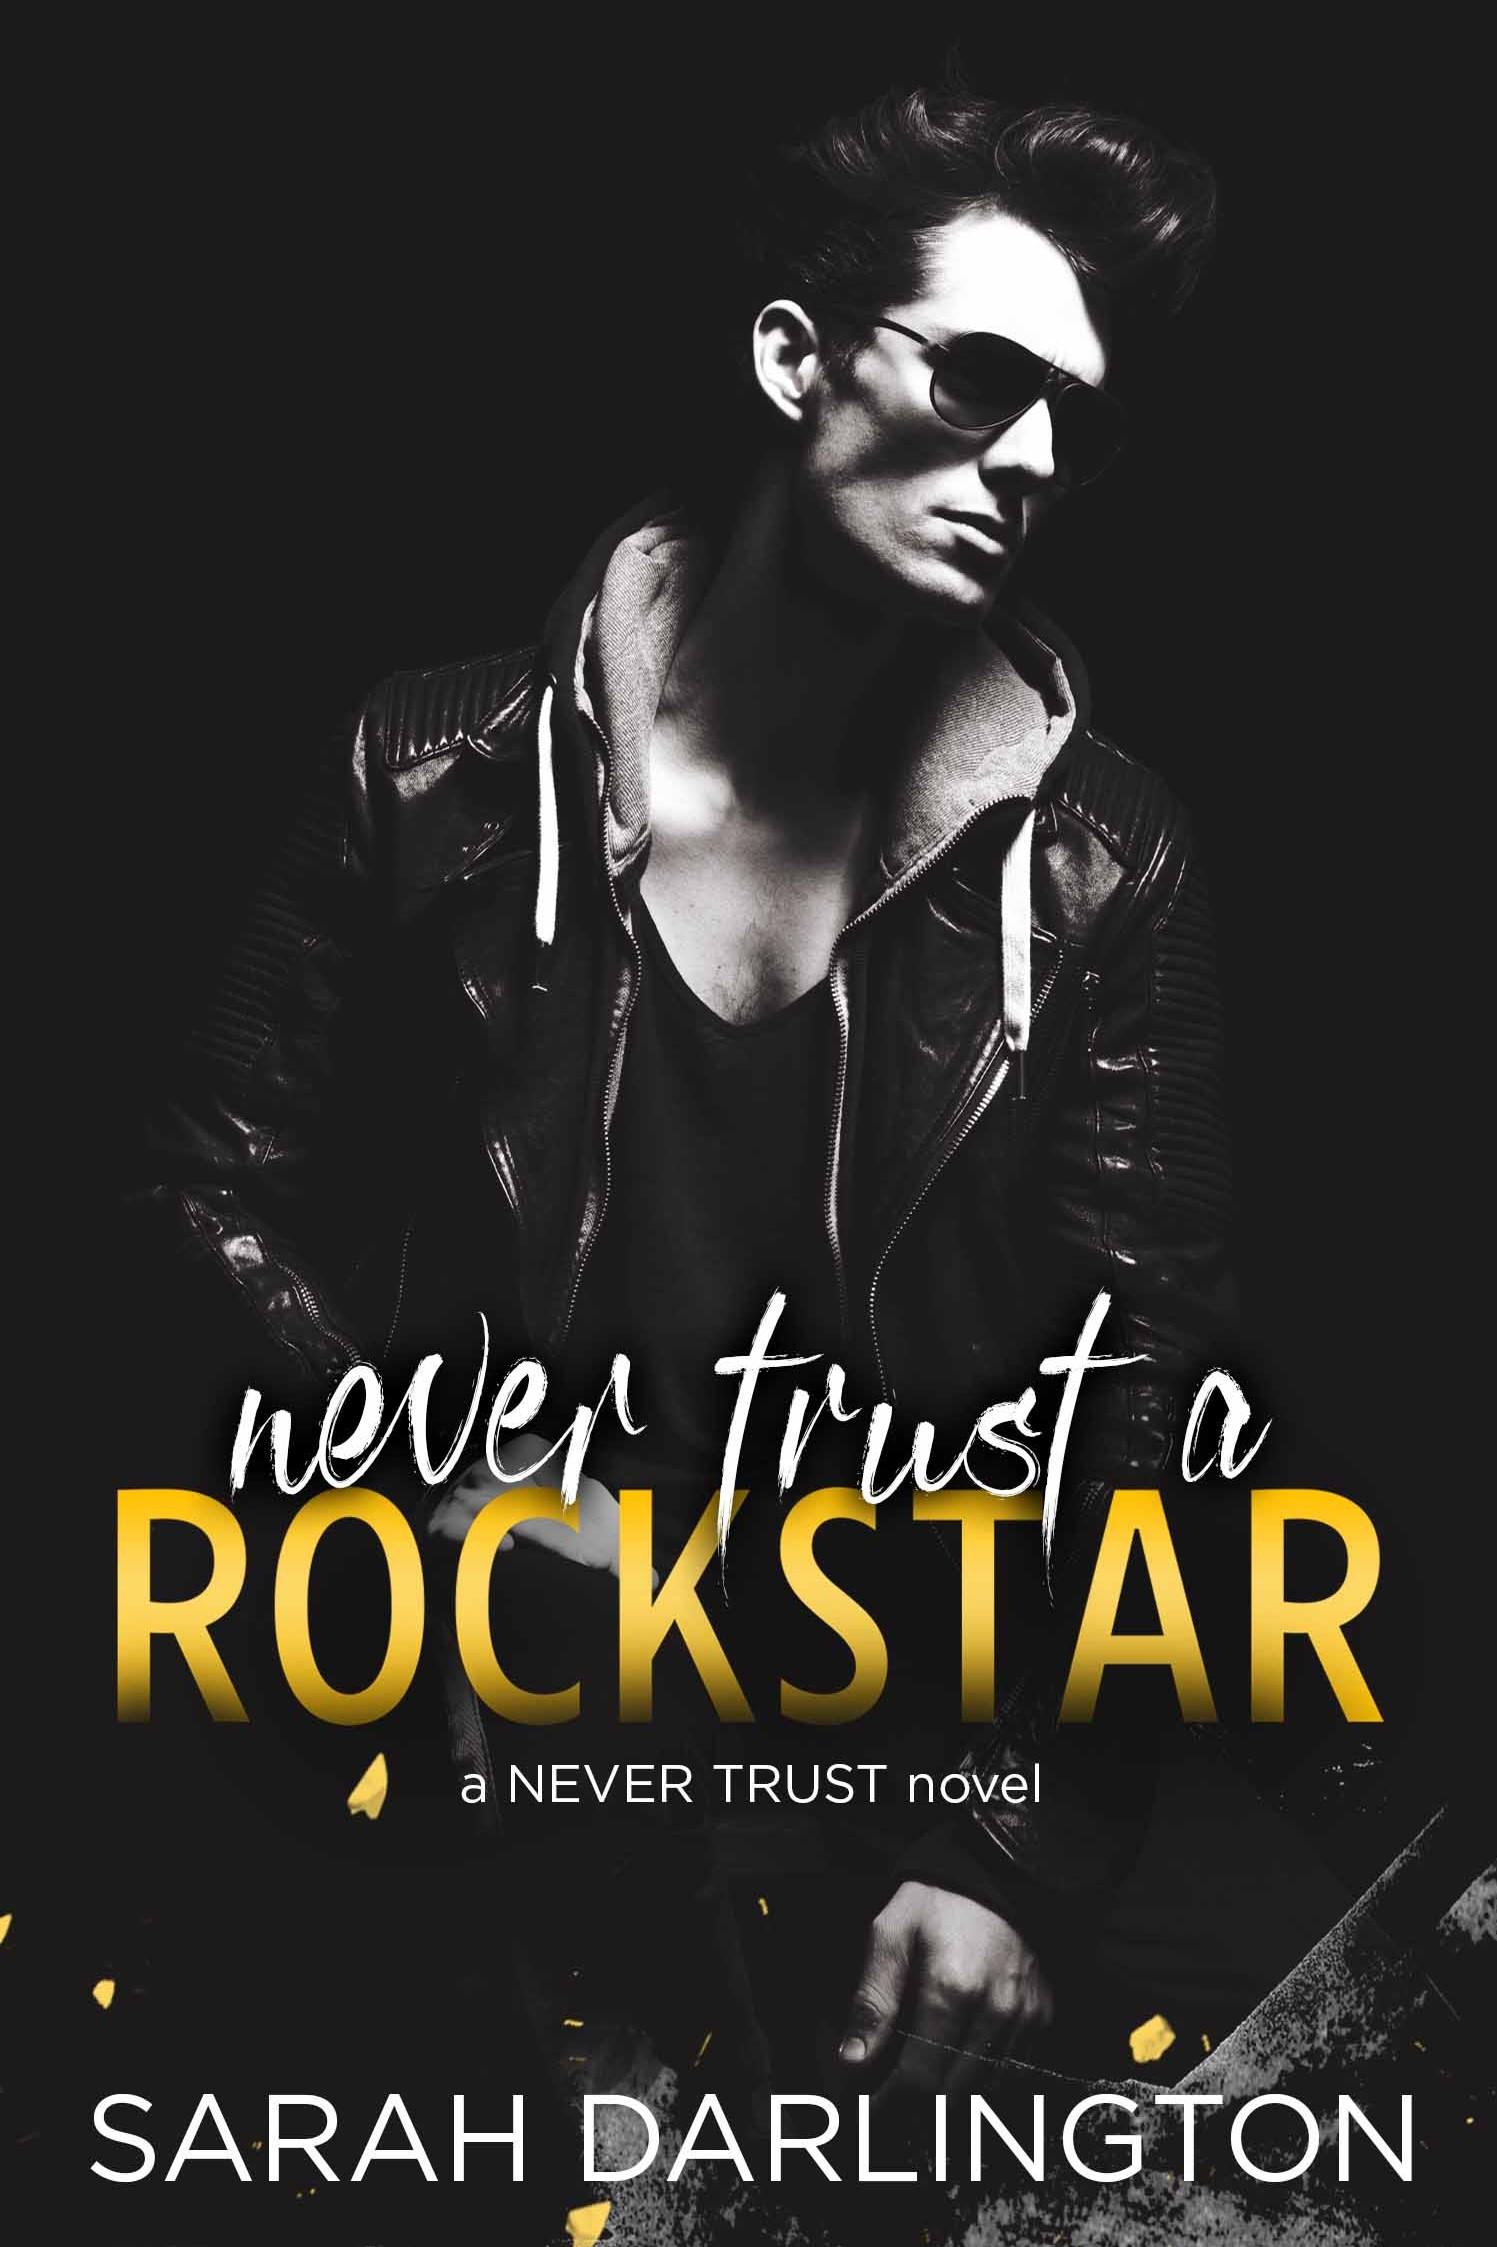 Never Trust a Rockstar by Sarah Darlington